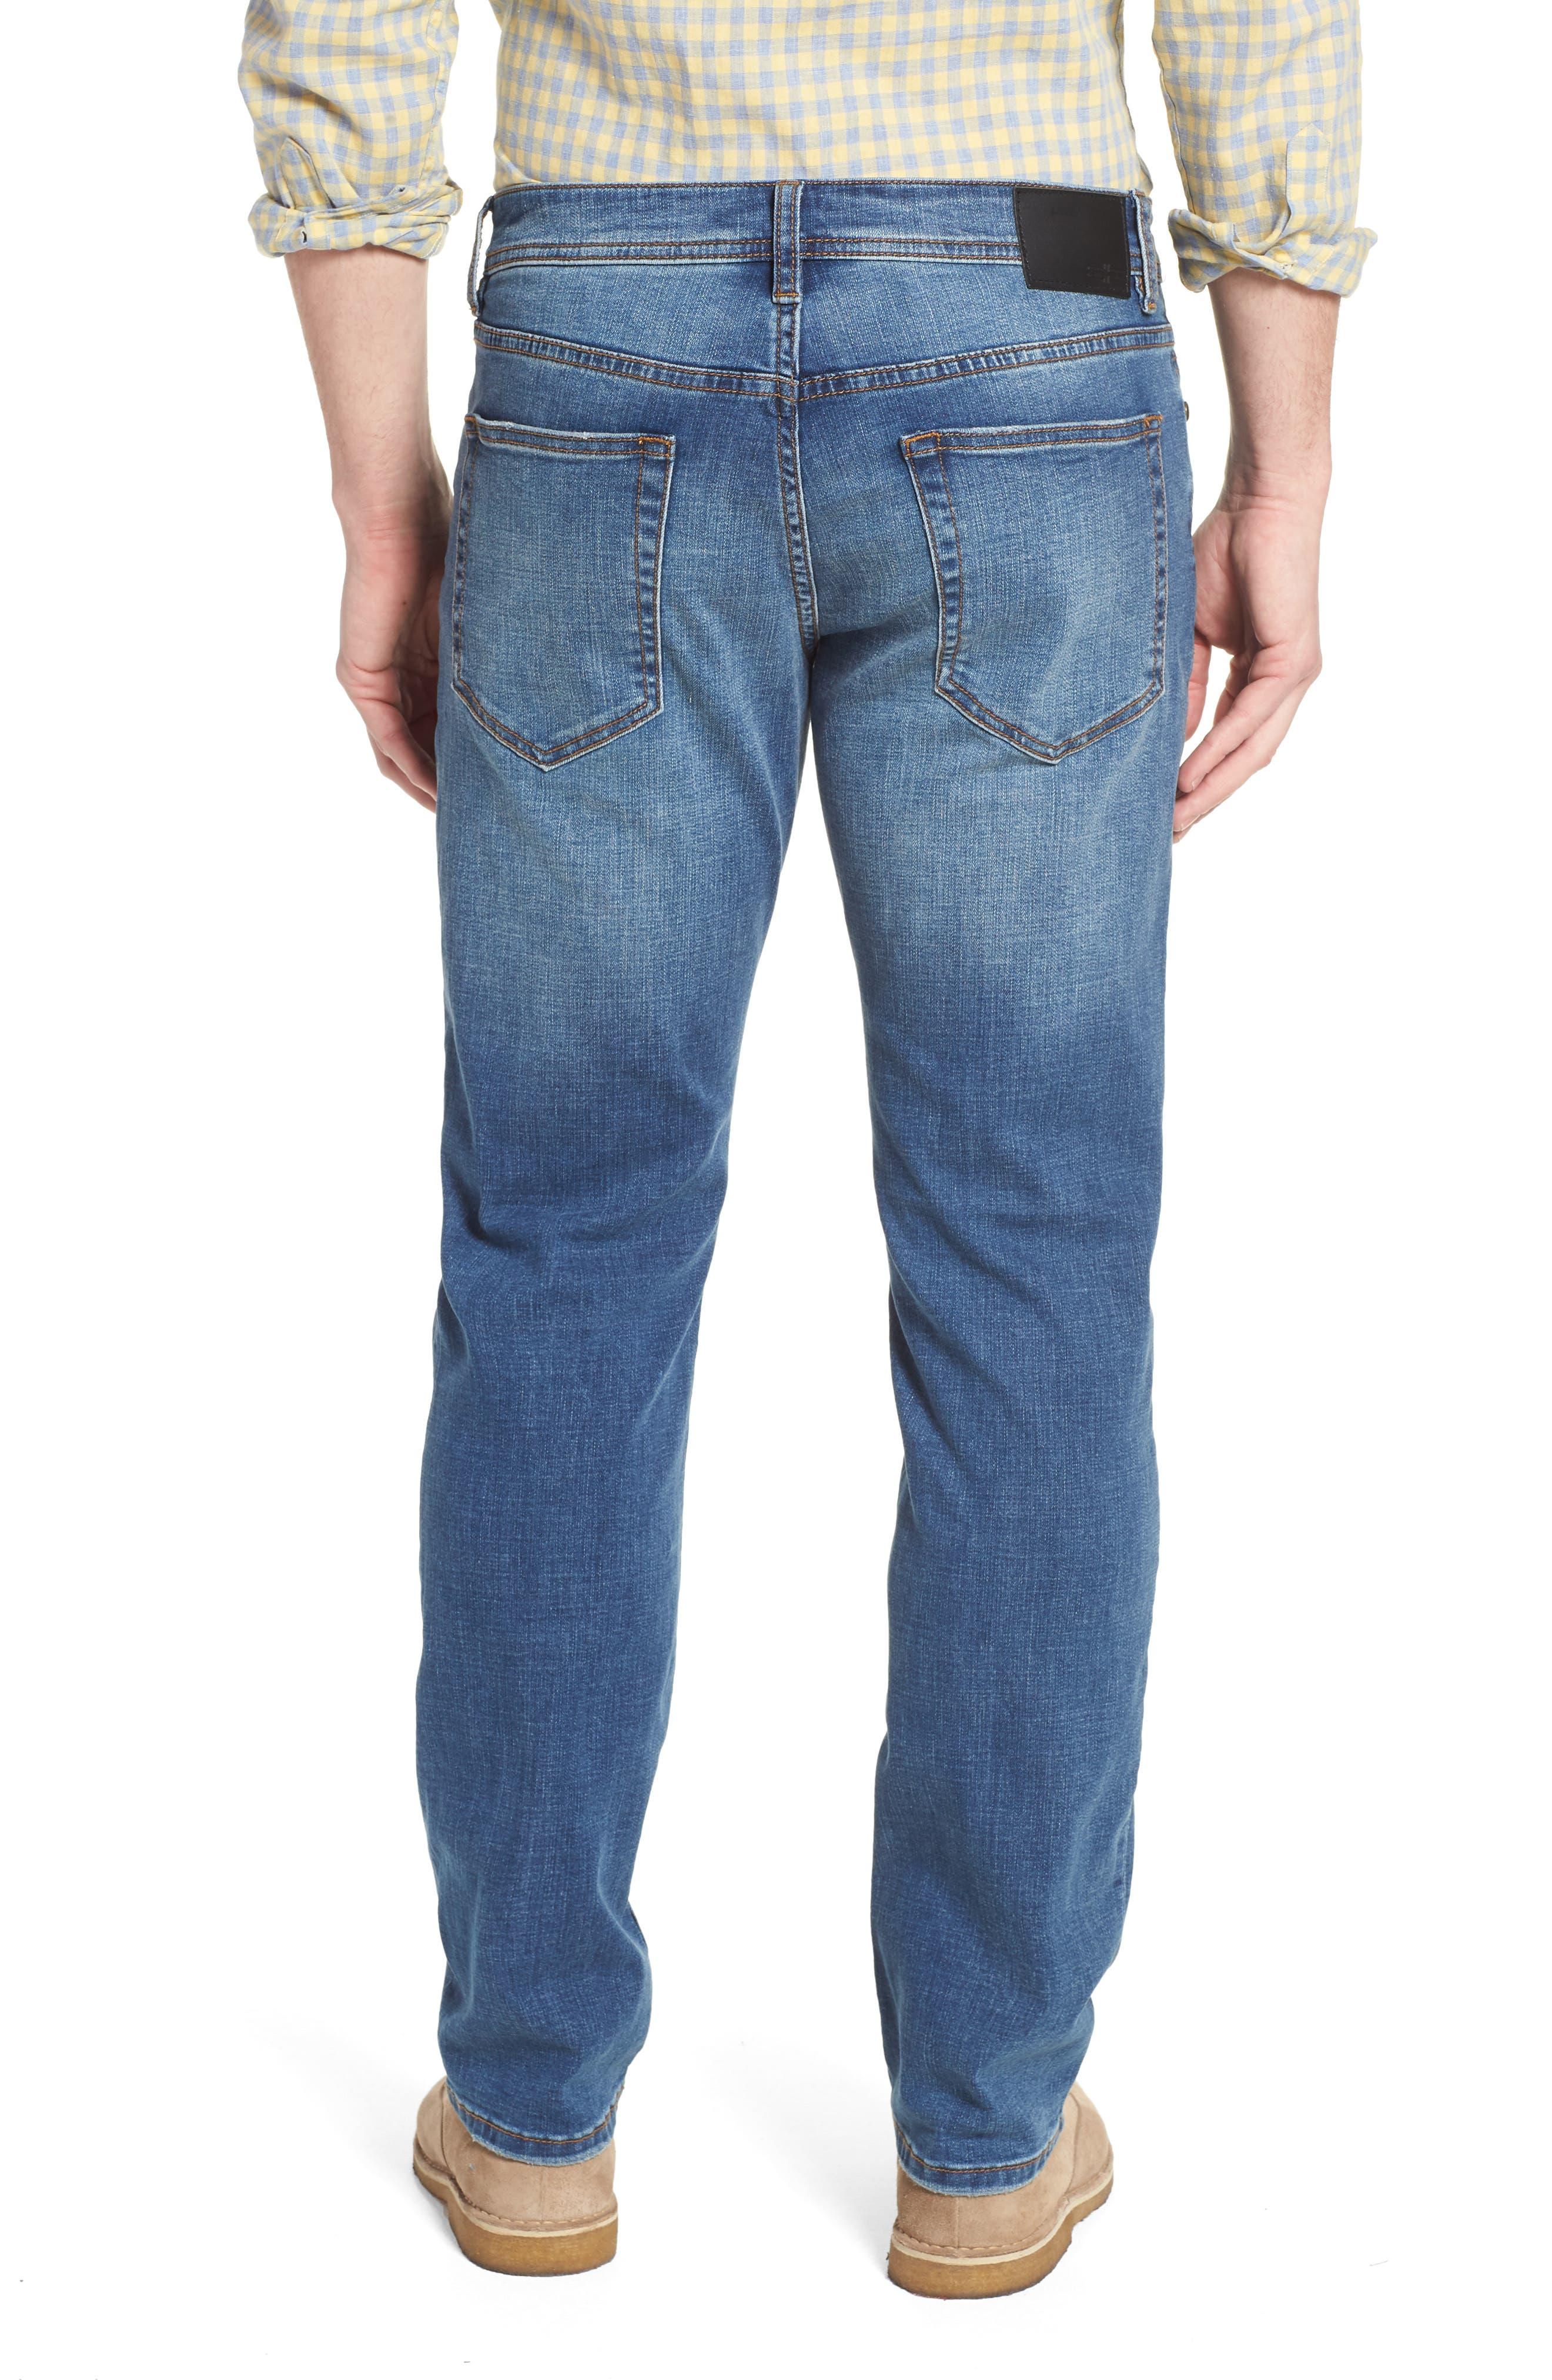 Jeans Co. Regent Relaxed Straight Leg Jeans,                             Alternate thumbnail 2, color,                             402